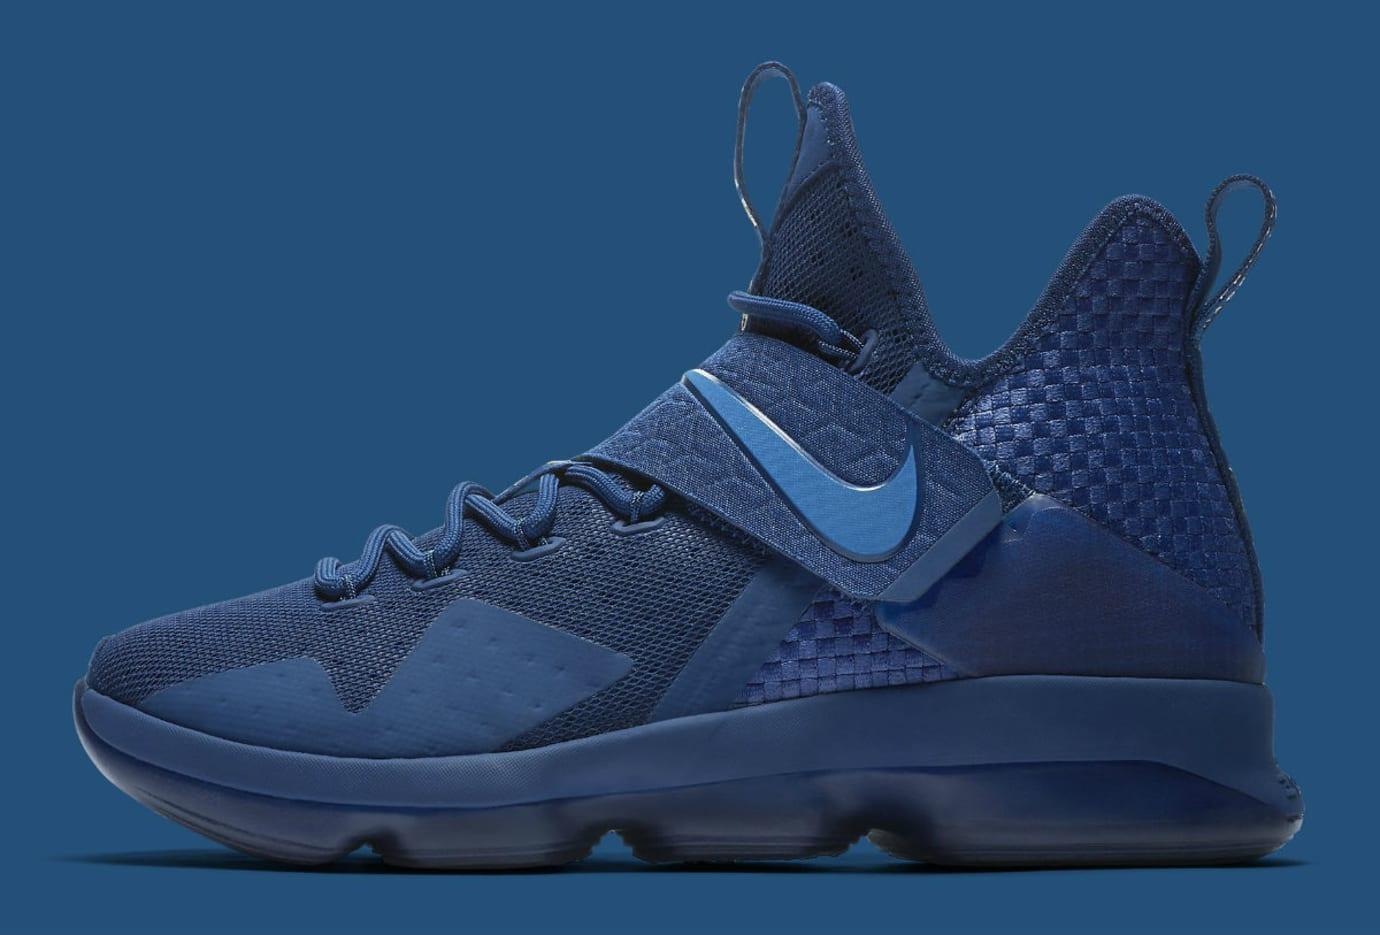 b4462820d52 Nike LeBron 14 Agimat U.S. Release Date Profile 852402-400